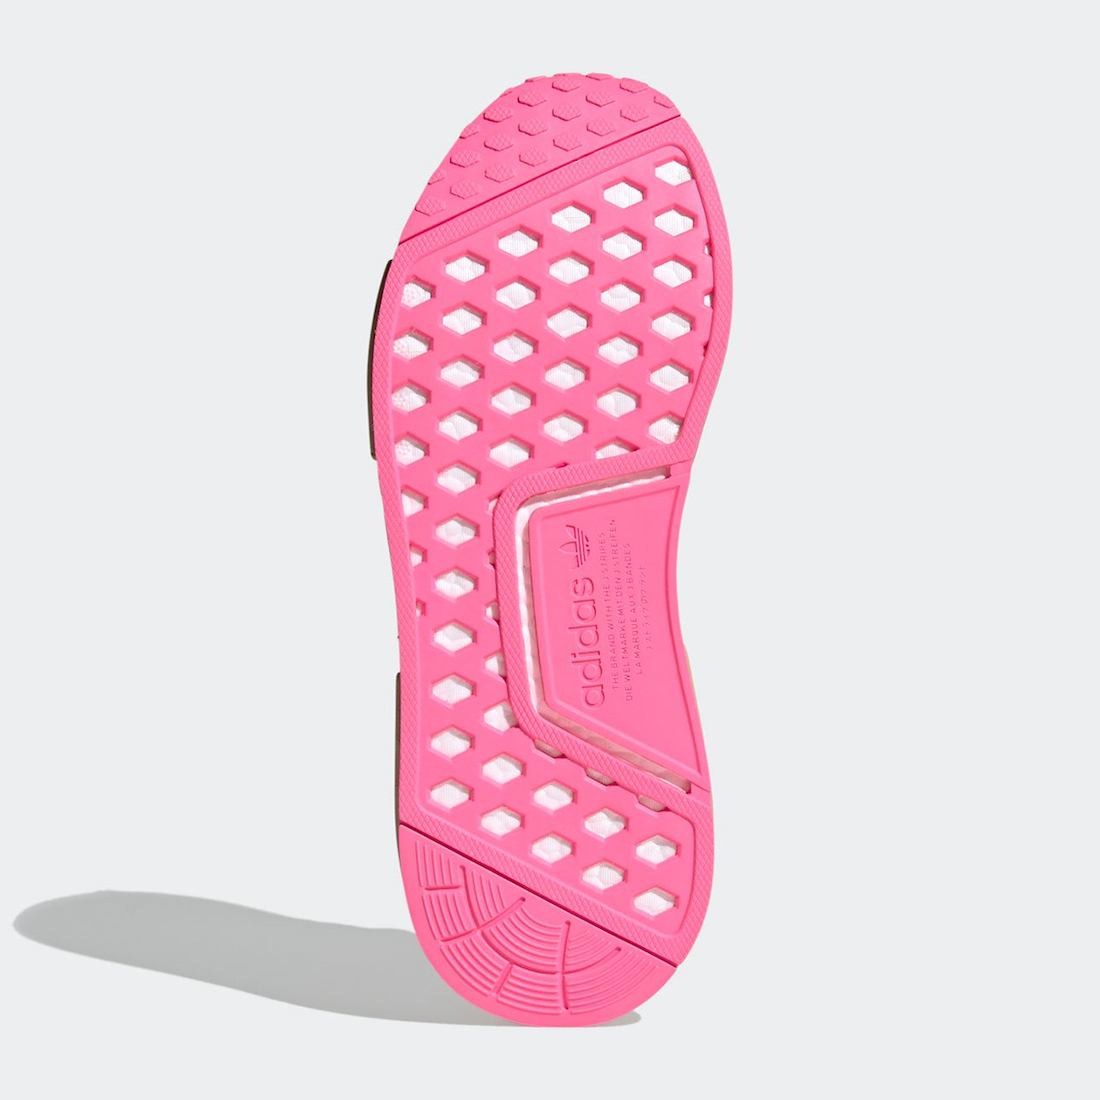 Primeknit鞋面, Primeknit, Originals, NMD R1, EVA, Boost, adidas Originals, adidas NMD R1, adidas NMD